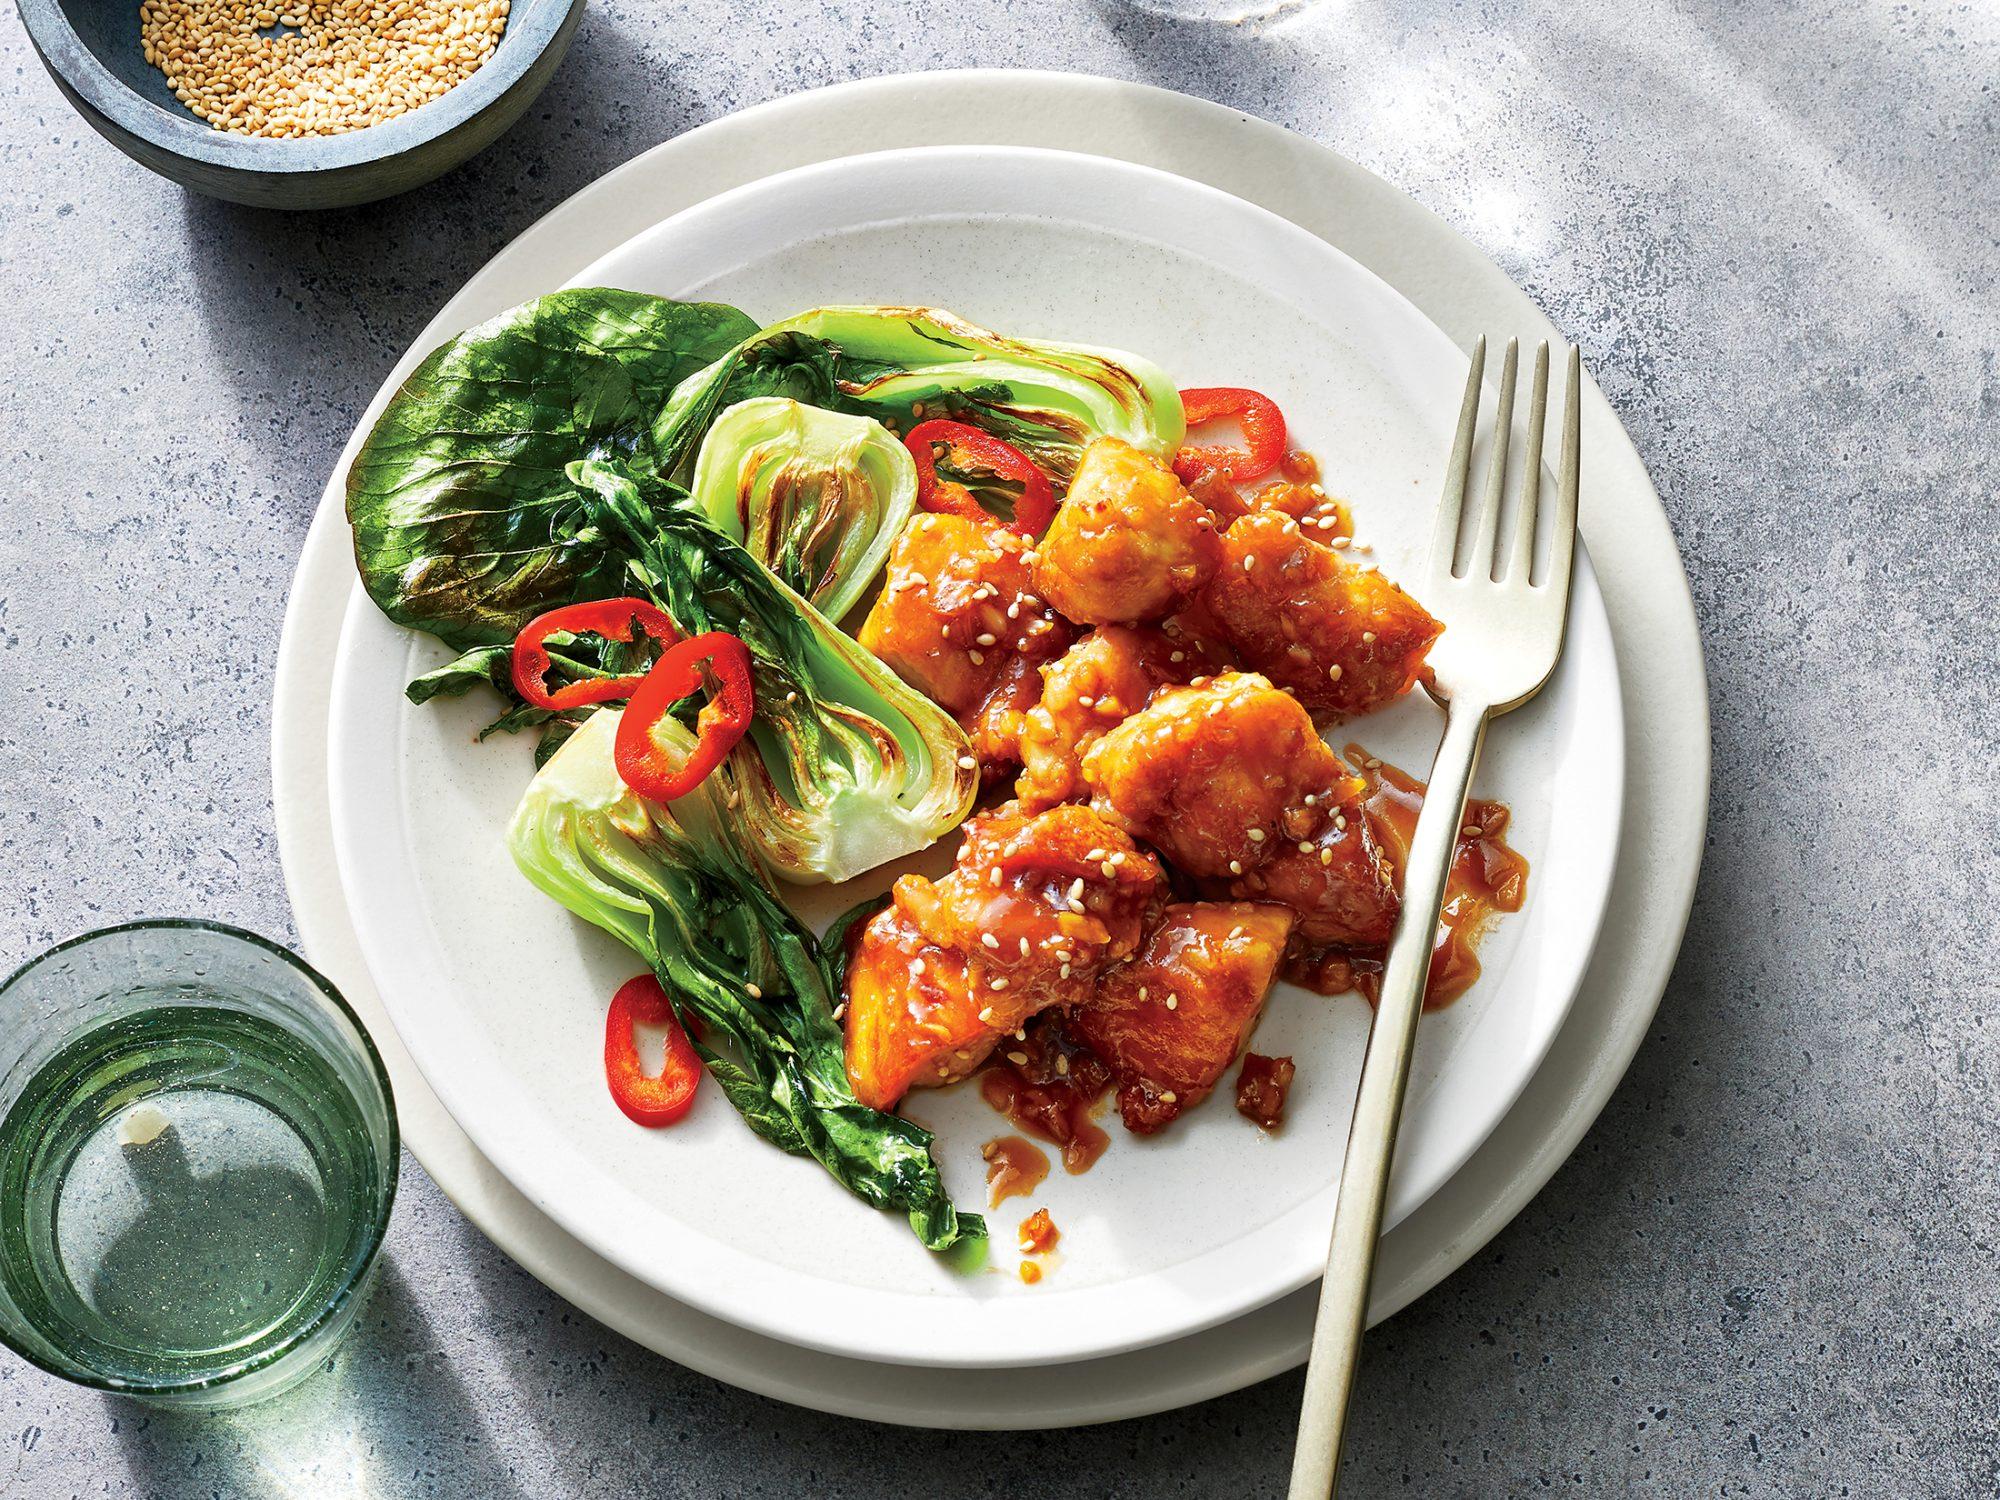 Chicken Stir-fry with Bok Choy